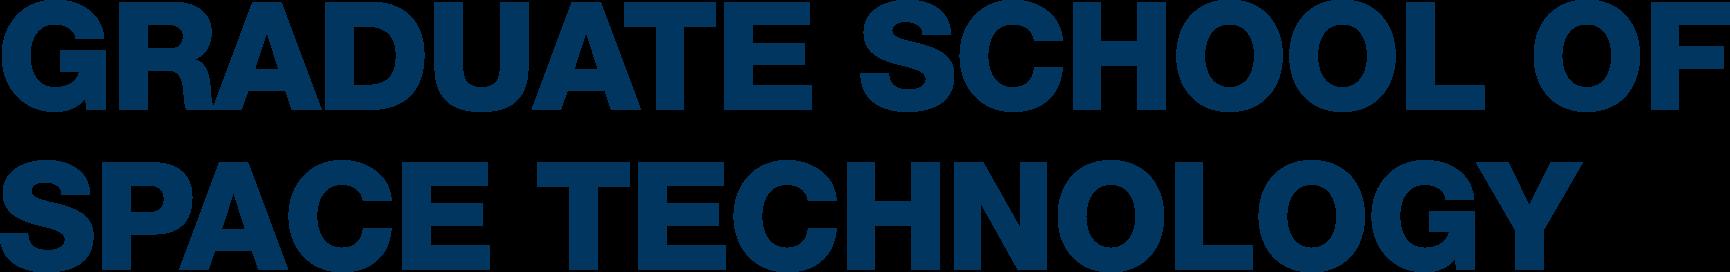 Logo of Graduate School of Space Technology